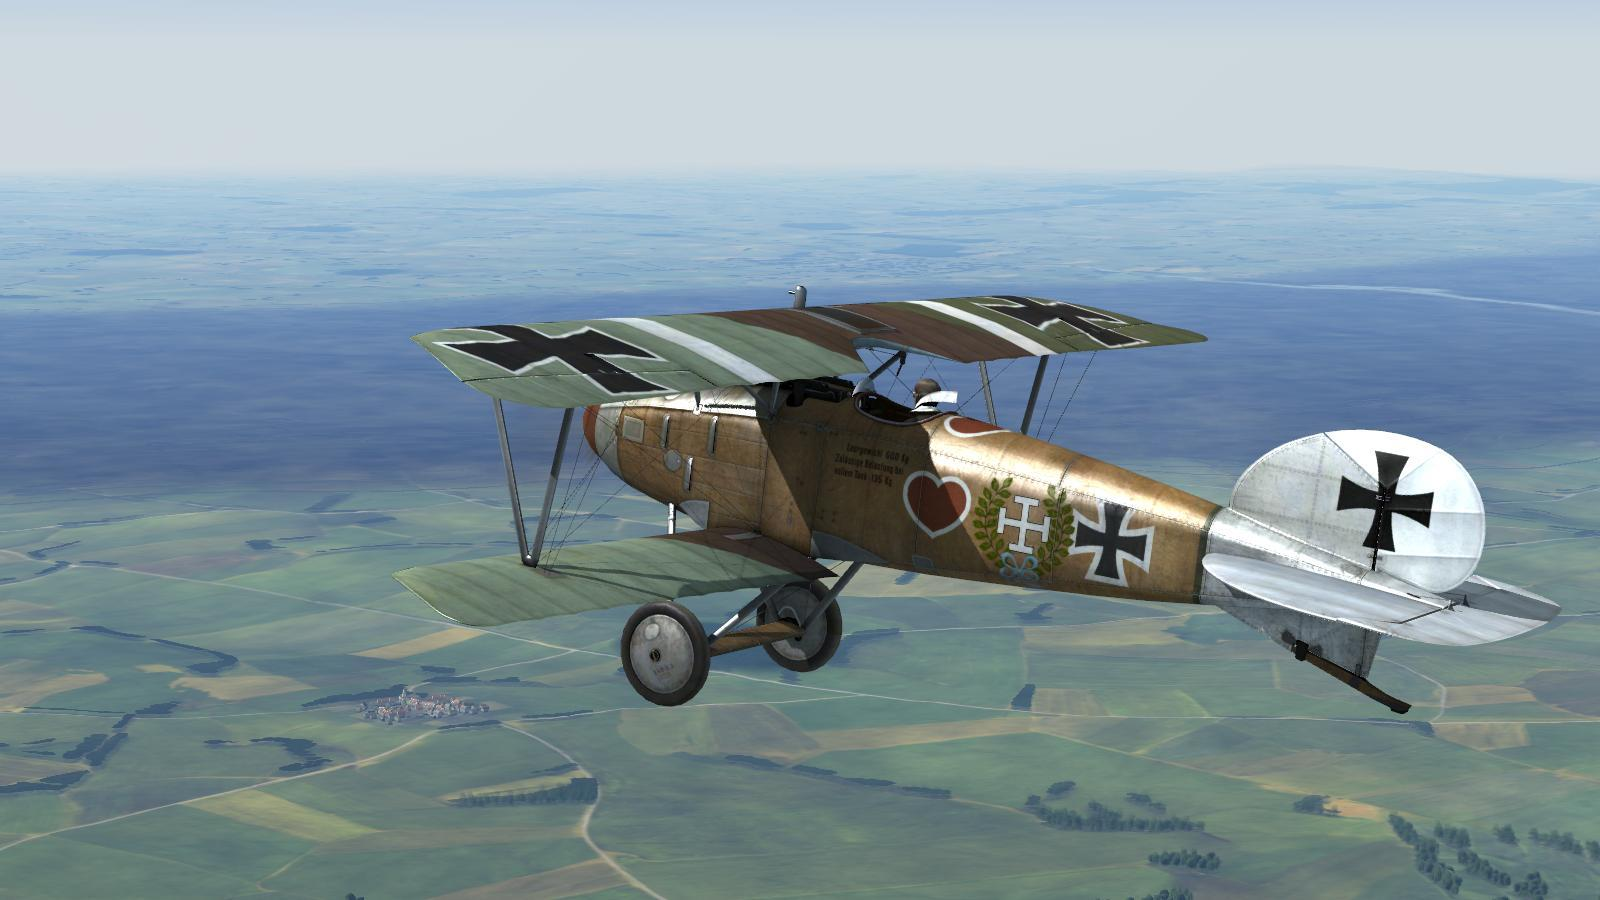 Ww2 Combat Flight Simulator or Combat Flight Simulator